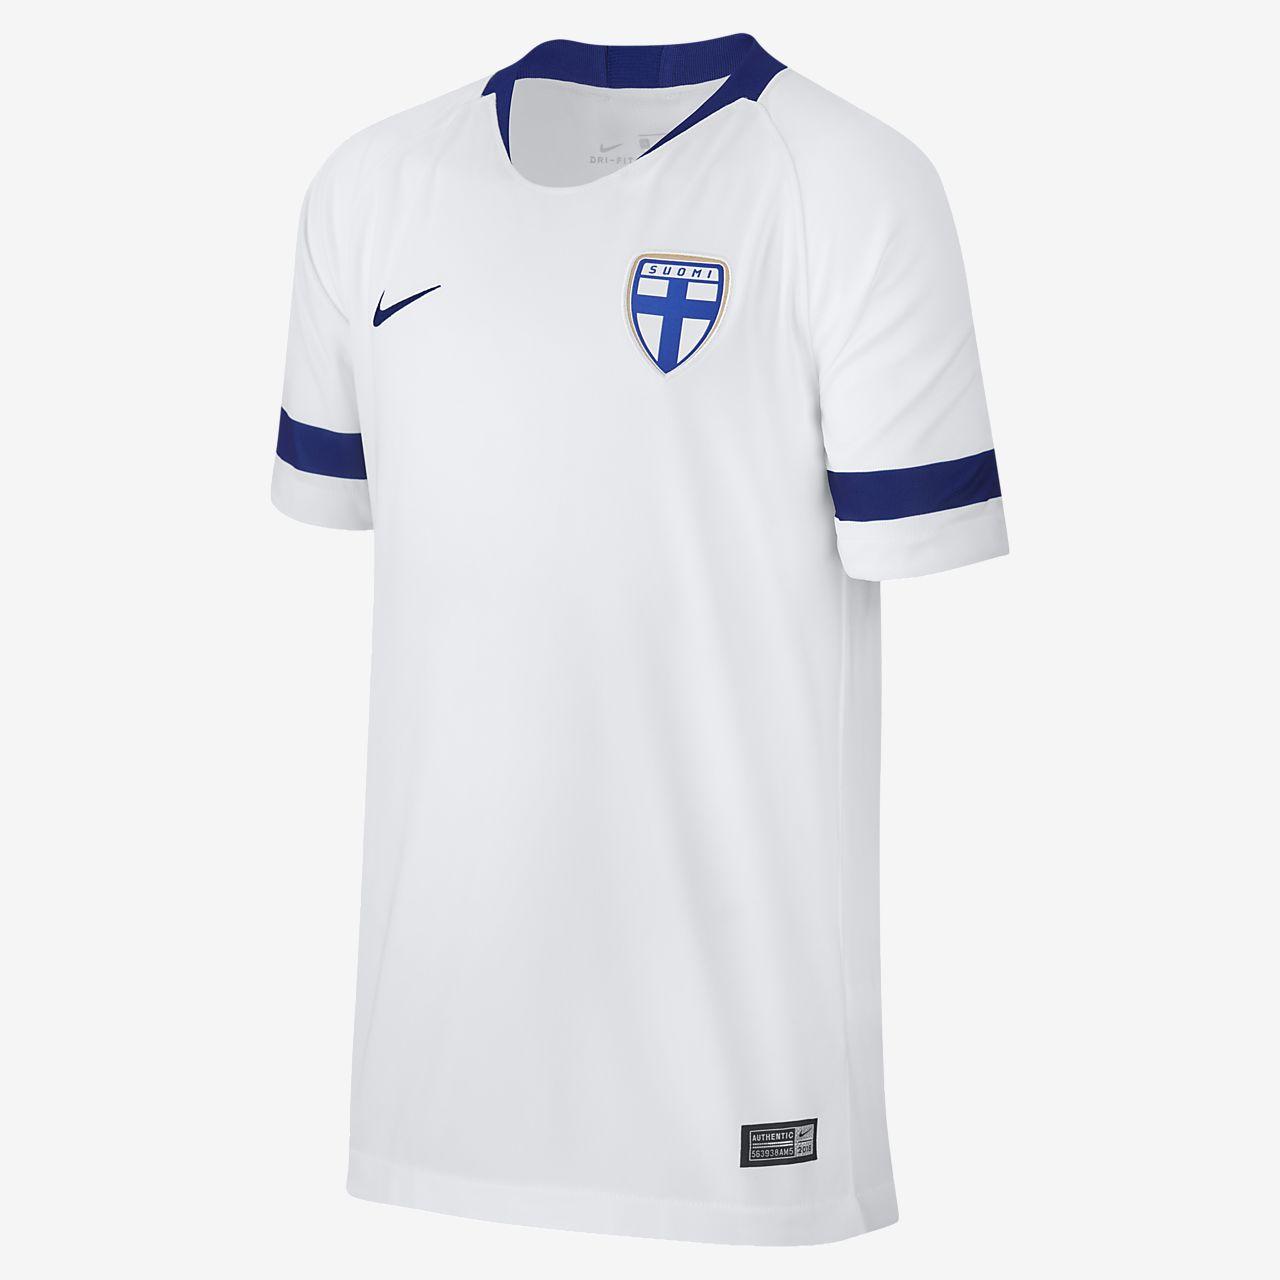 2018 Finnland Stadium Home Fußballtrikot für ältere Kinder